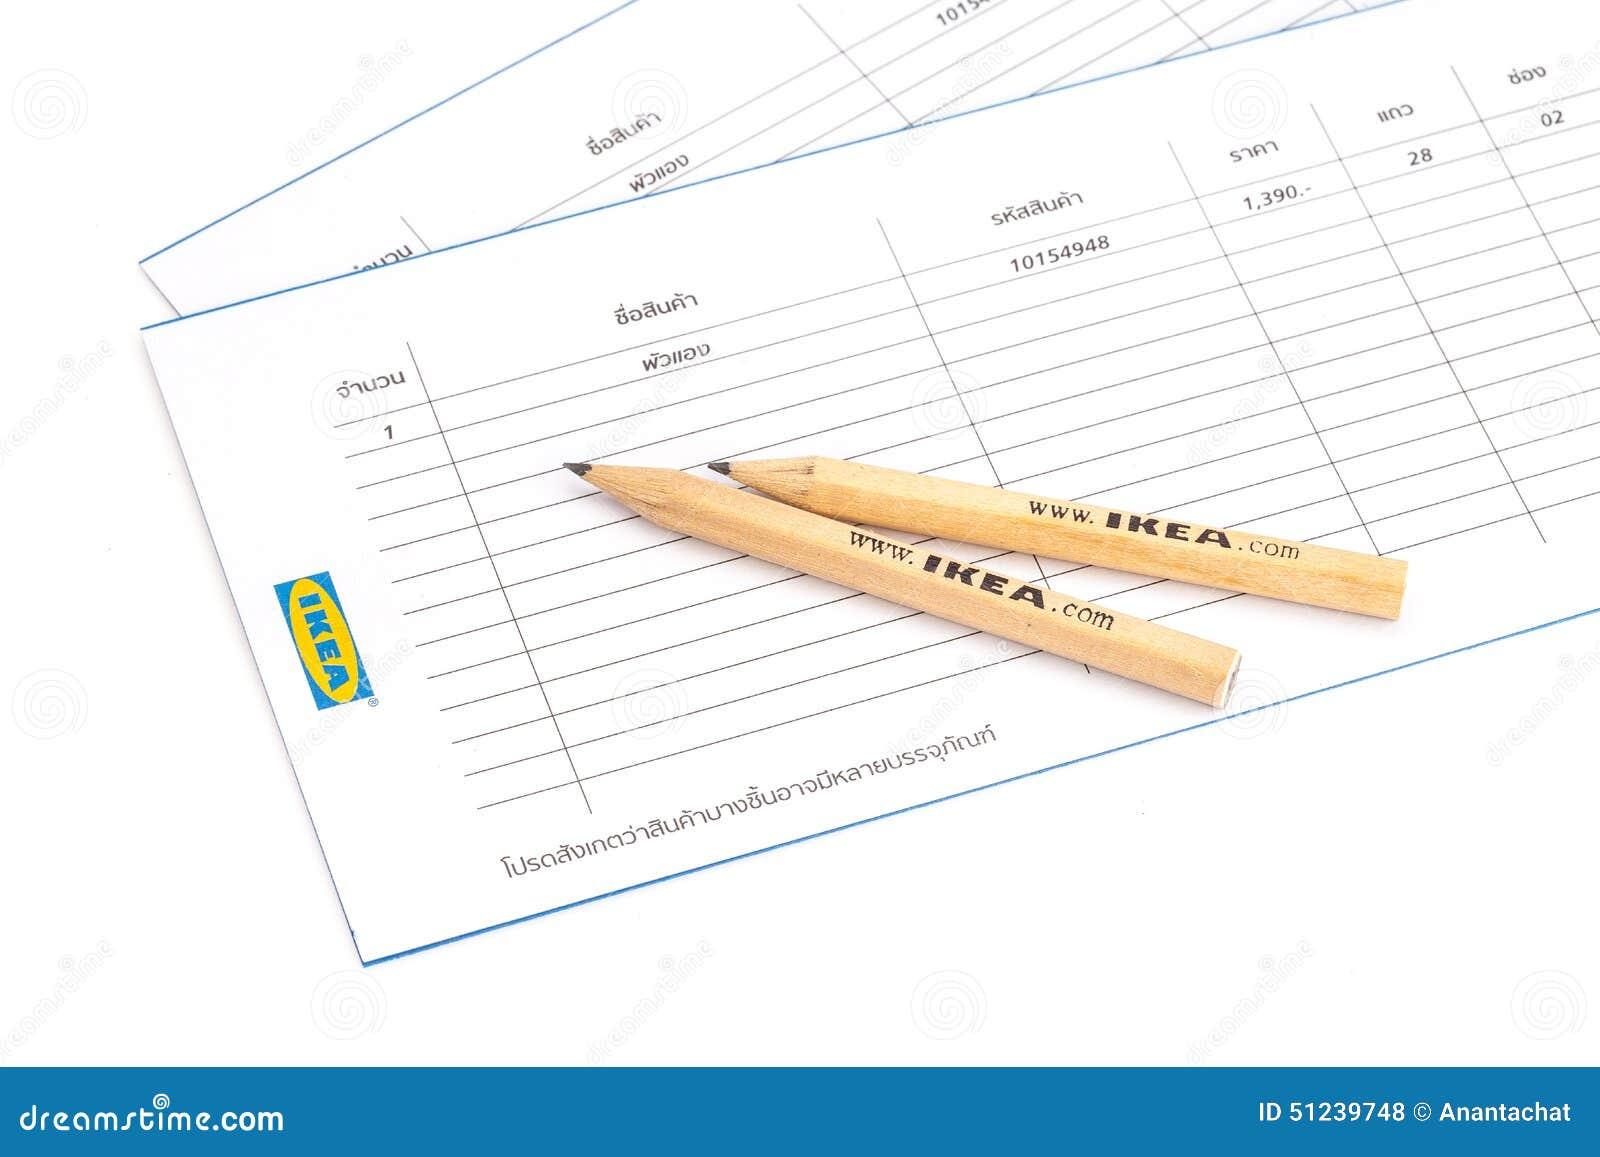 Ikea Einkaufsliste